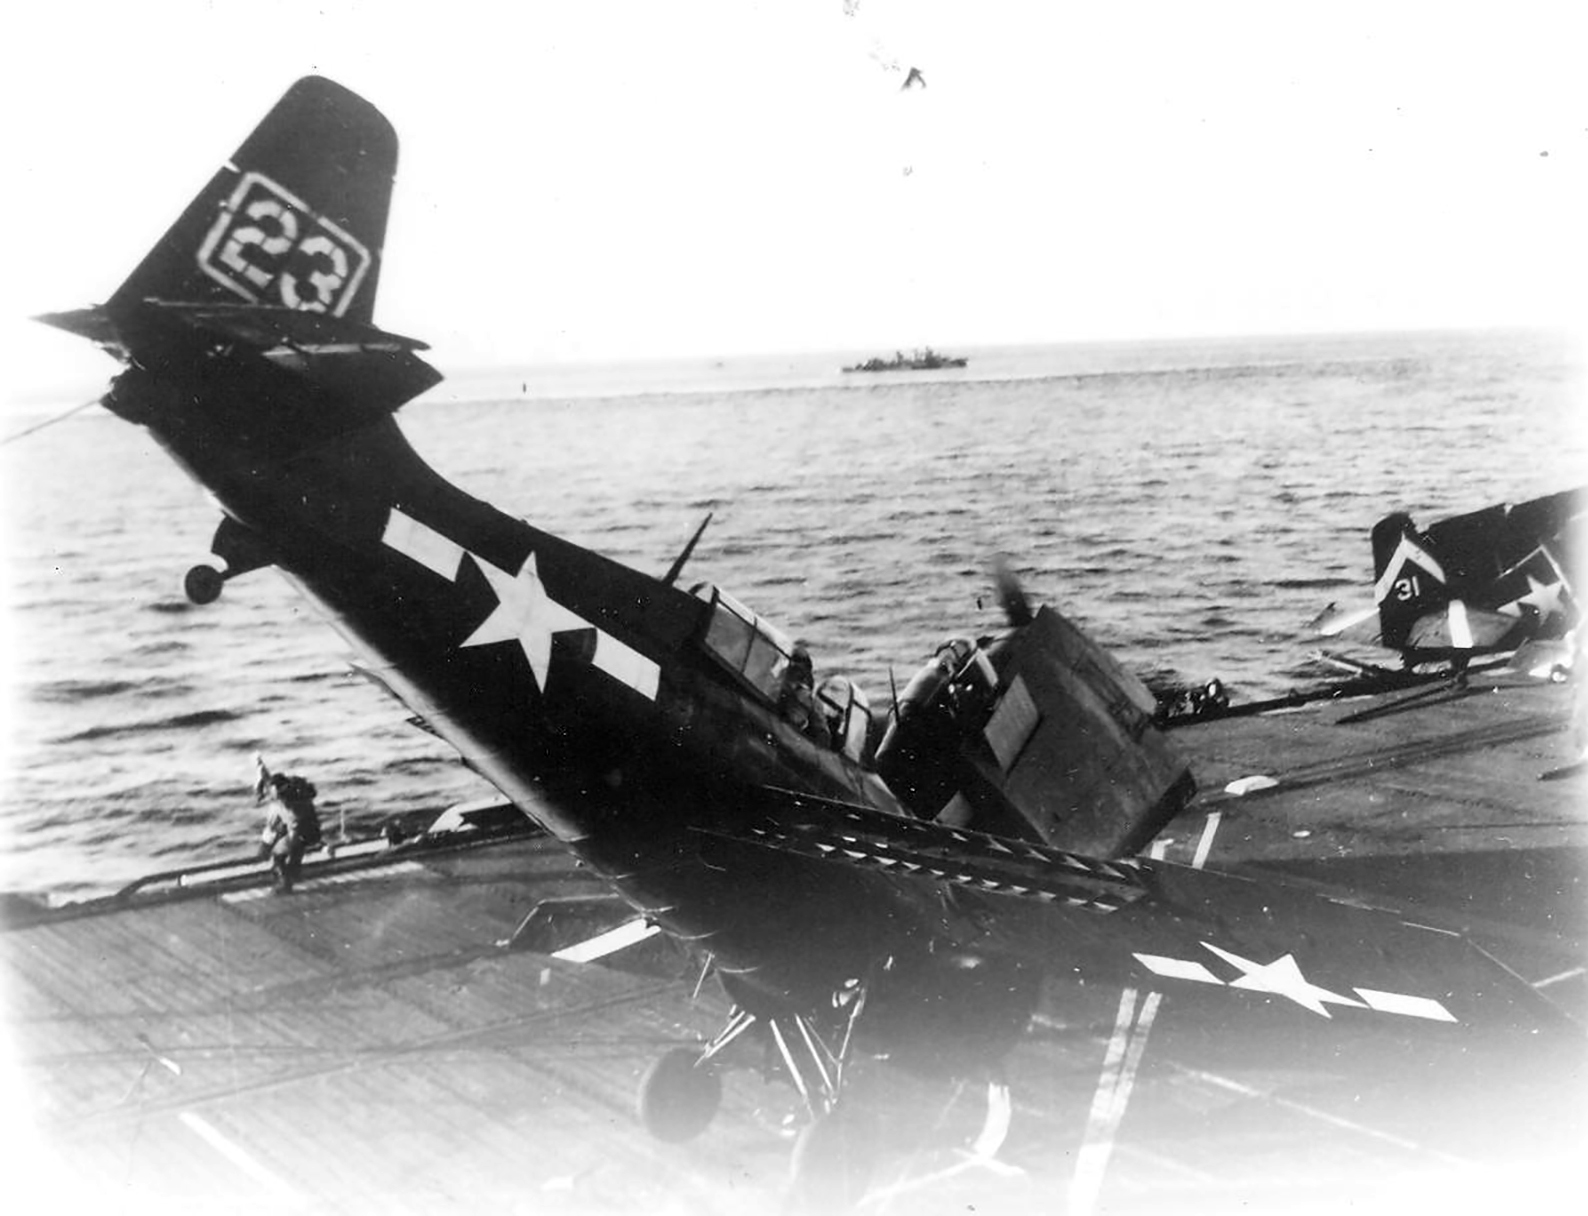 FM 2 Wildcat VC 75 White 23 landing mishap CVE 61 USS Manila Bay 1945 01